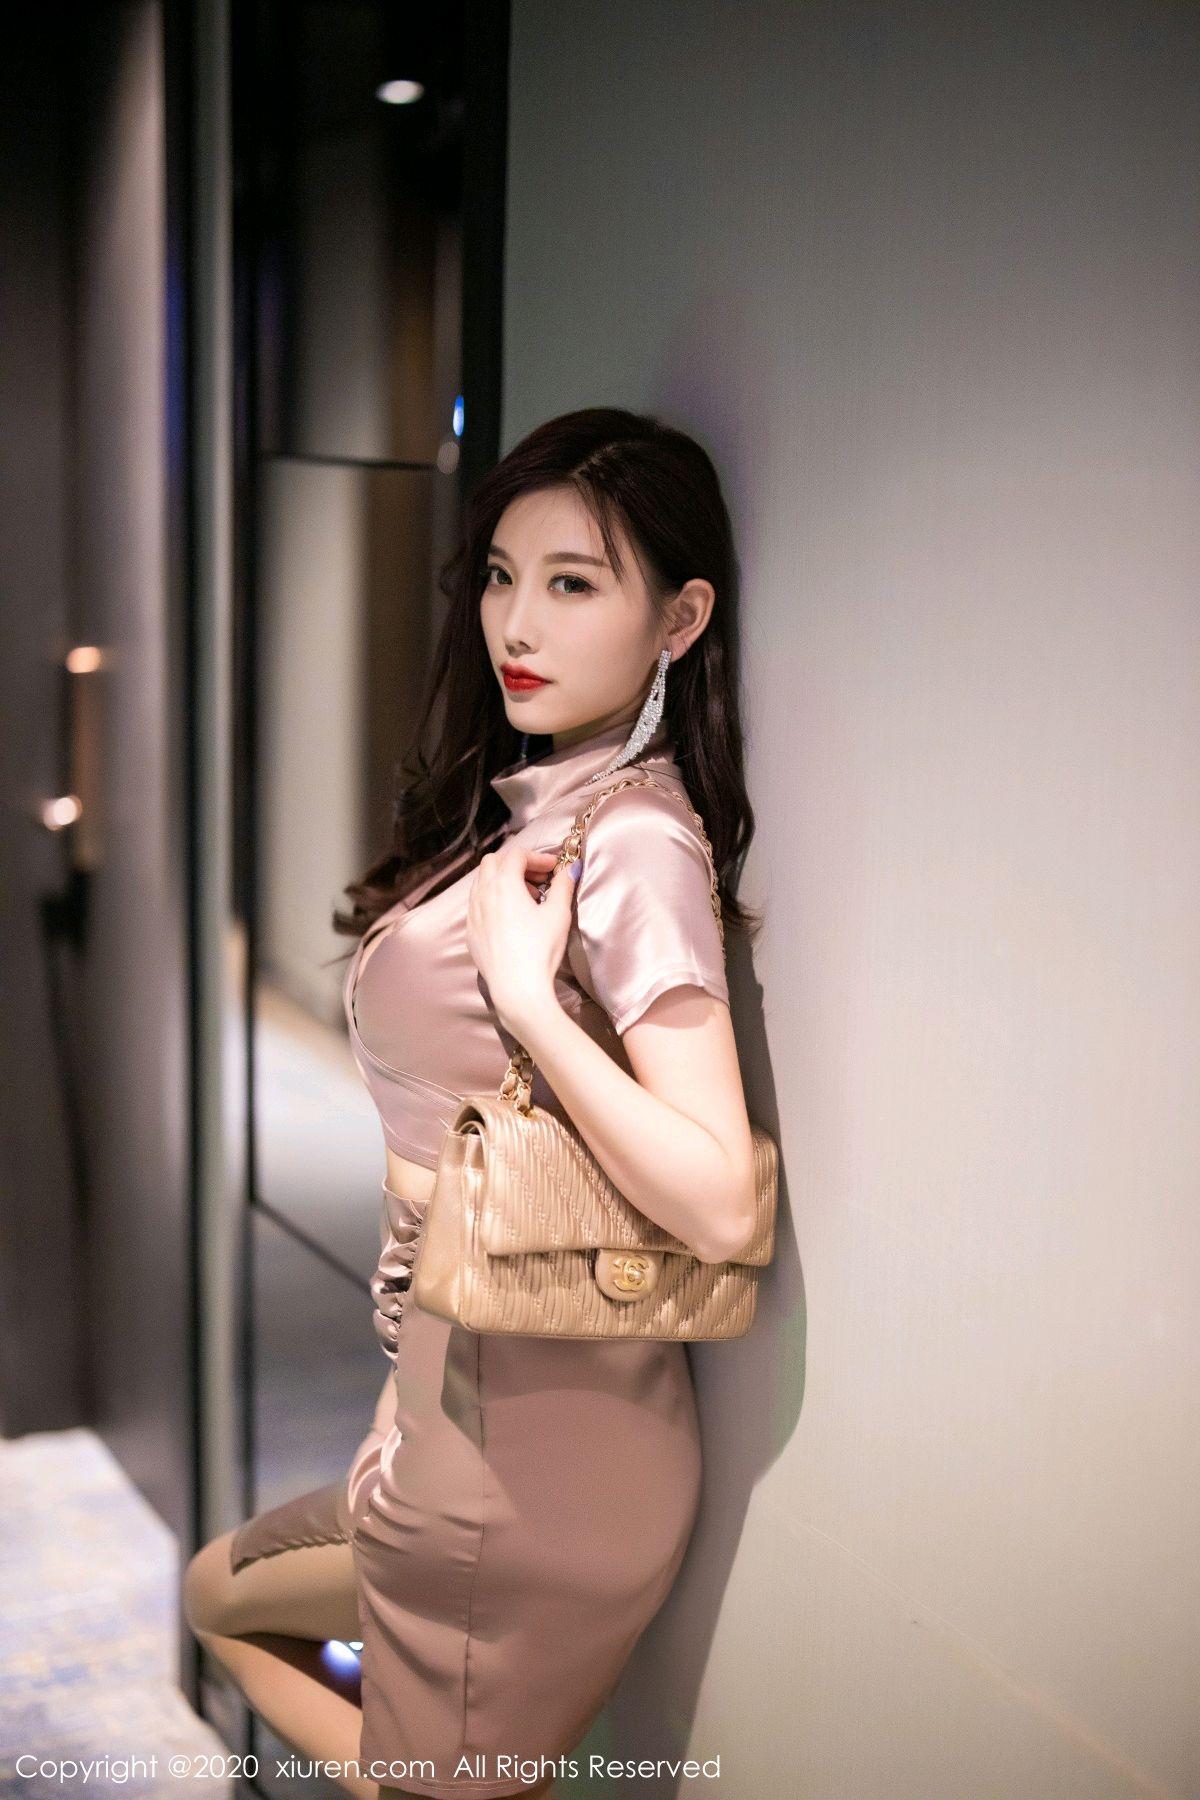 [XiuRen] Vol.2587 Yang Chen Chen 20P, Underwear, Xiuren, Yang Chen Chen